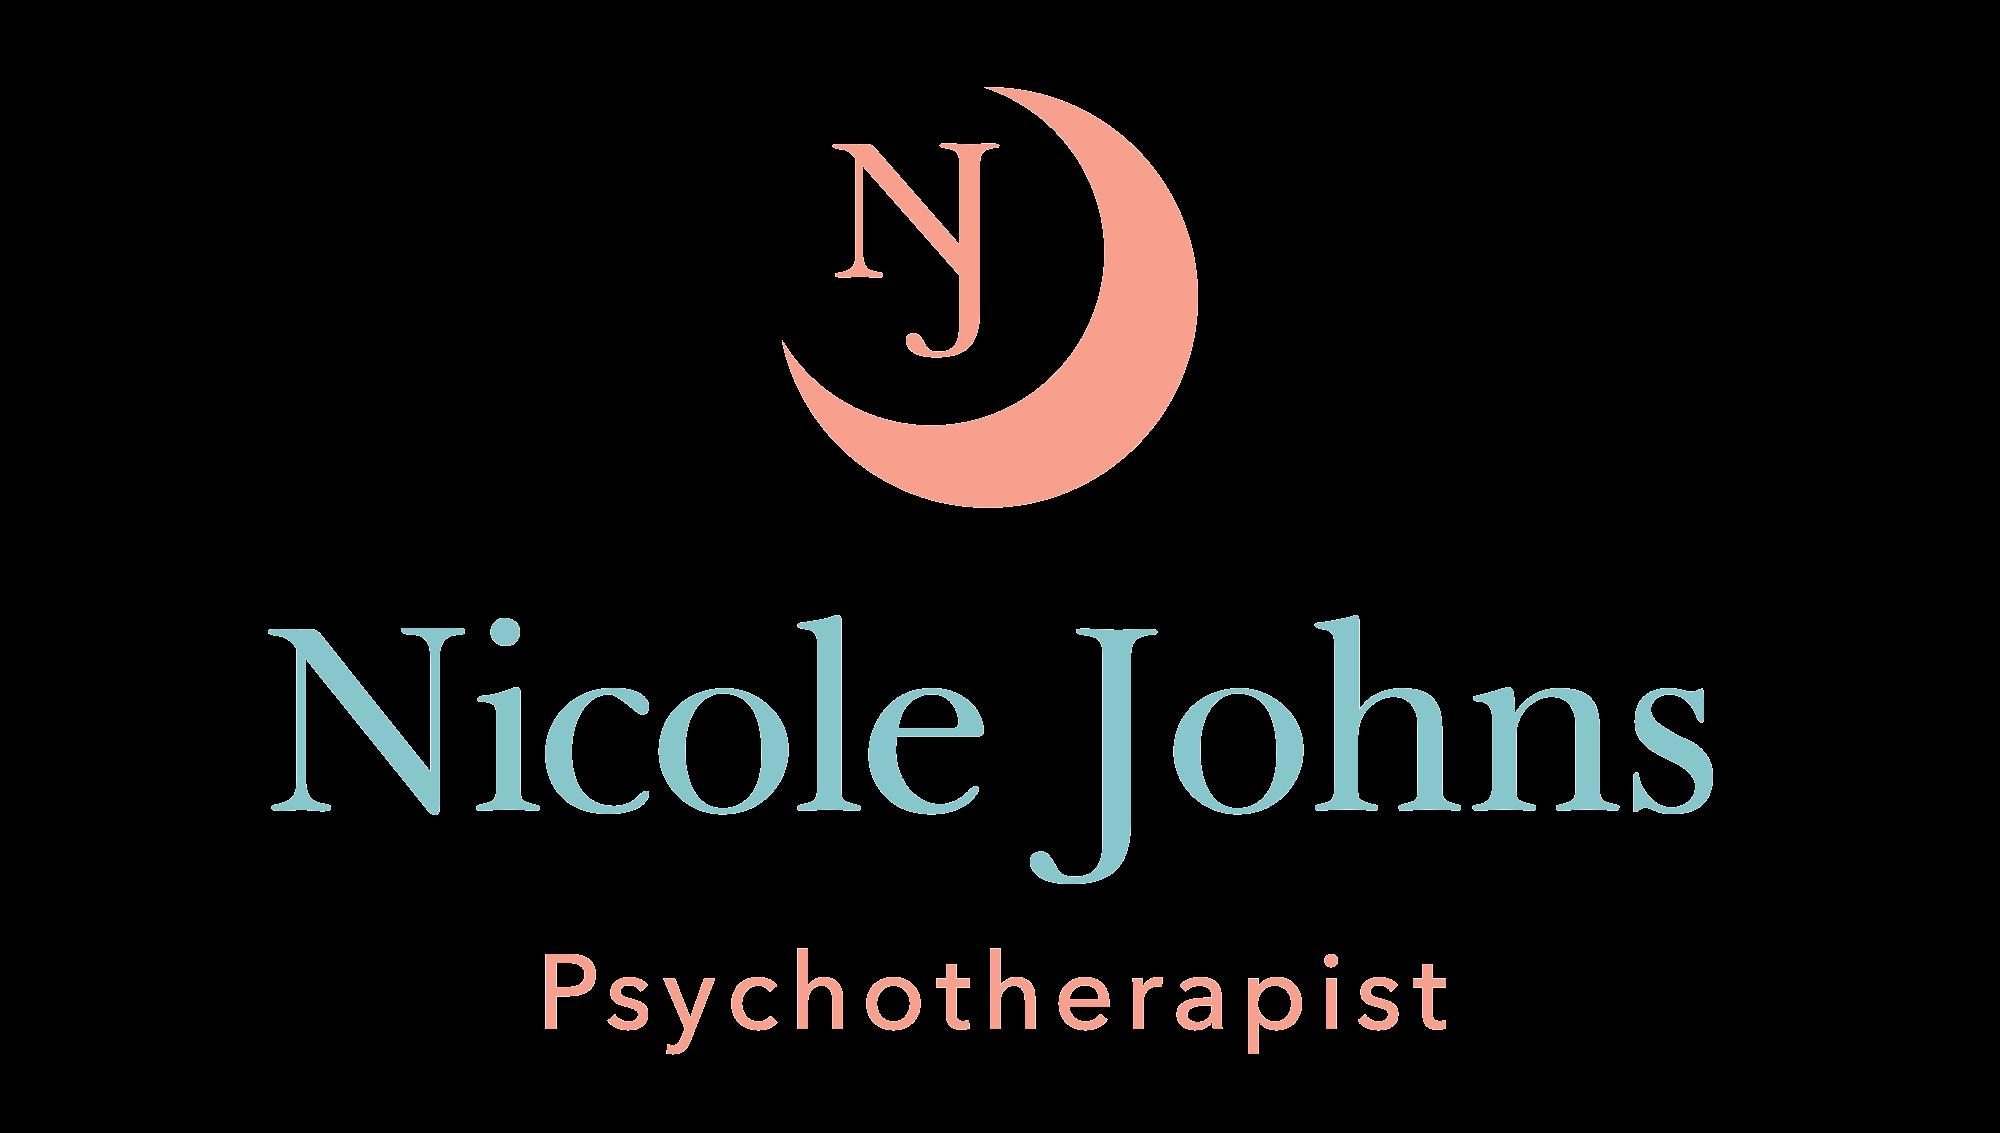 Telehealth Psychotherapist logo design